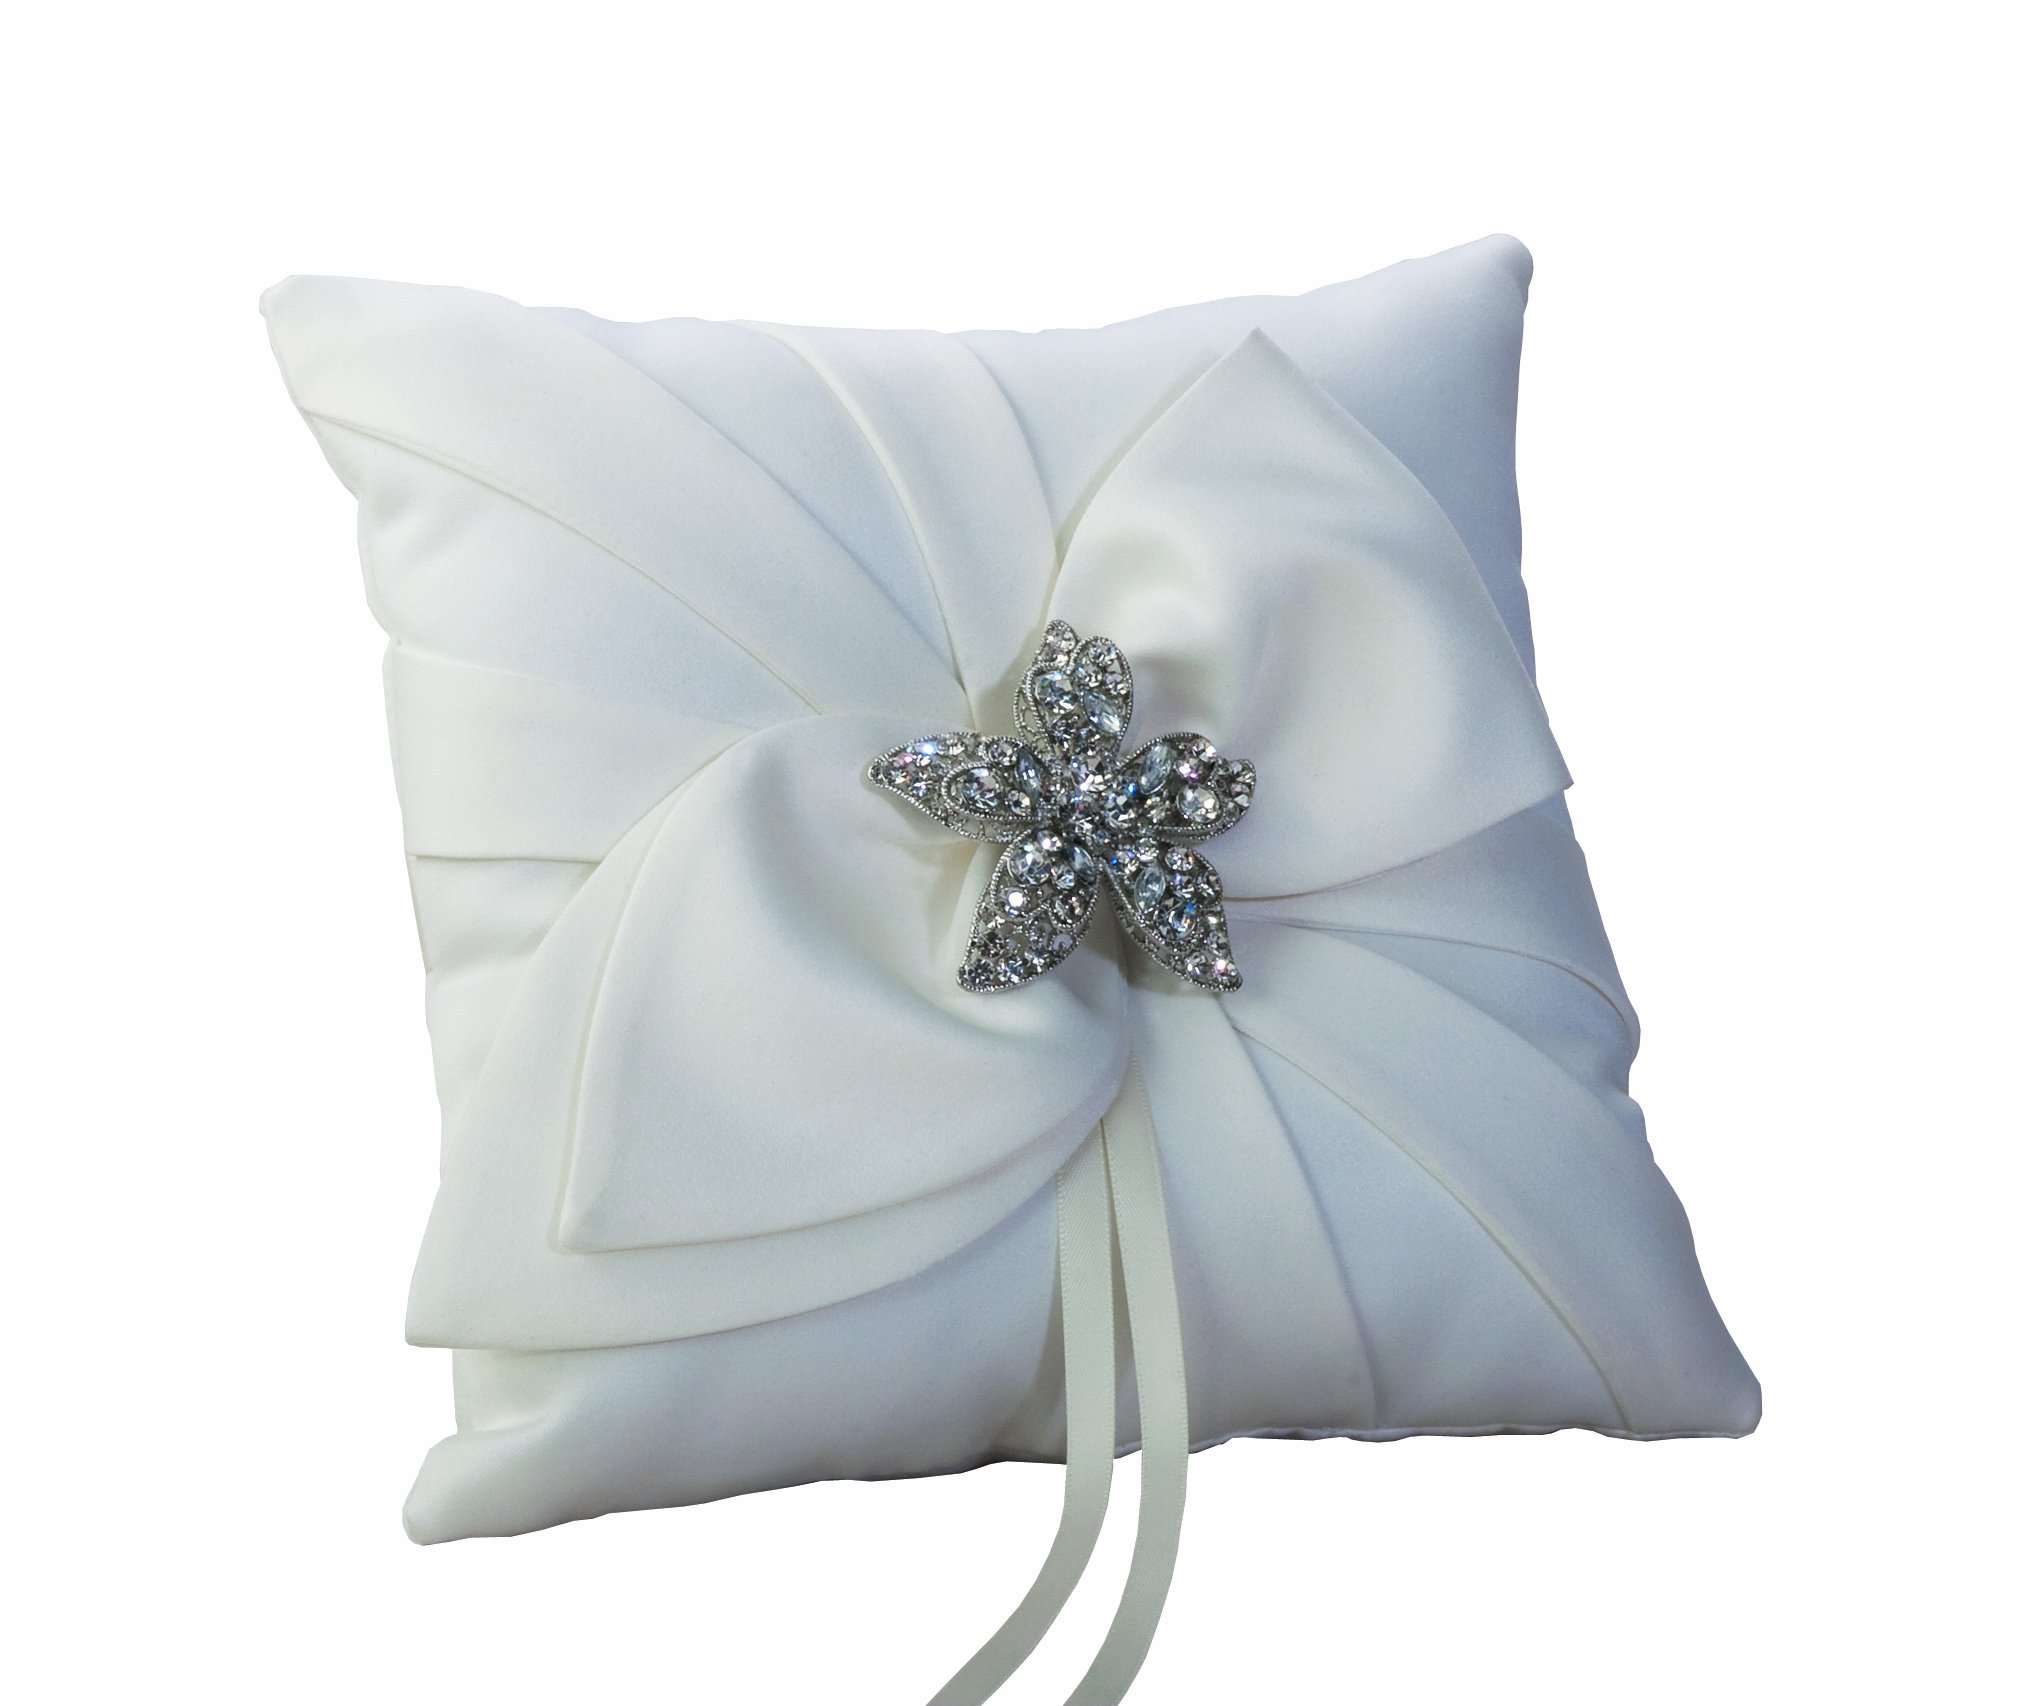 Ivy Lane Design Eva Collection Ring Pillow, White